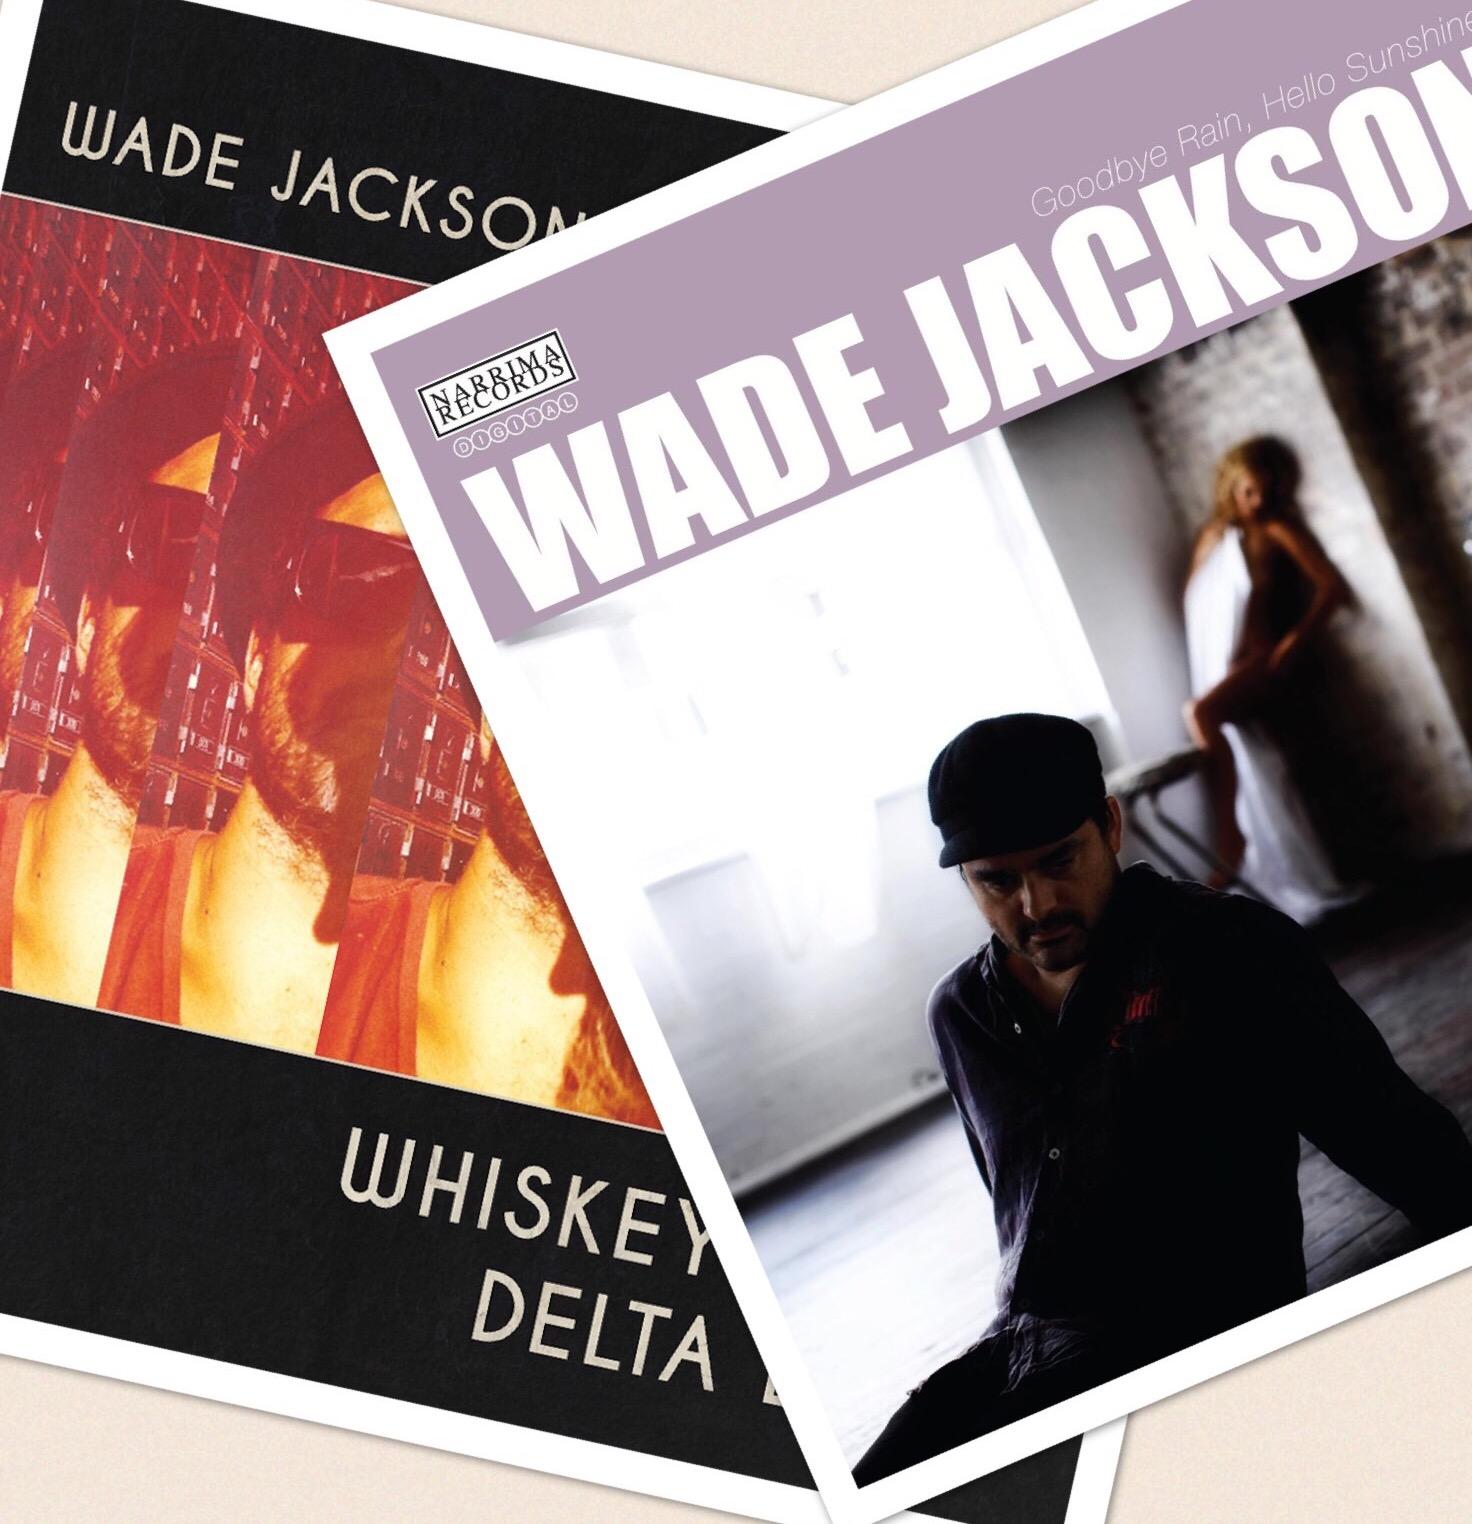 W.A.D.E and Goodbye Rain, Hello Sunshine DIGITAL - Wade Jackson